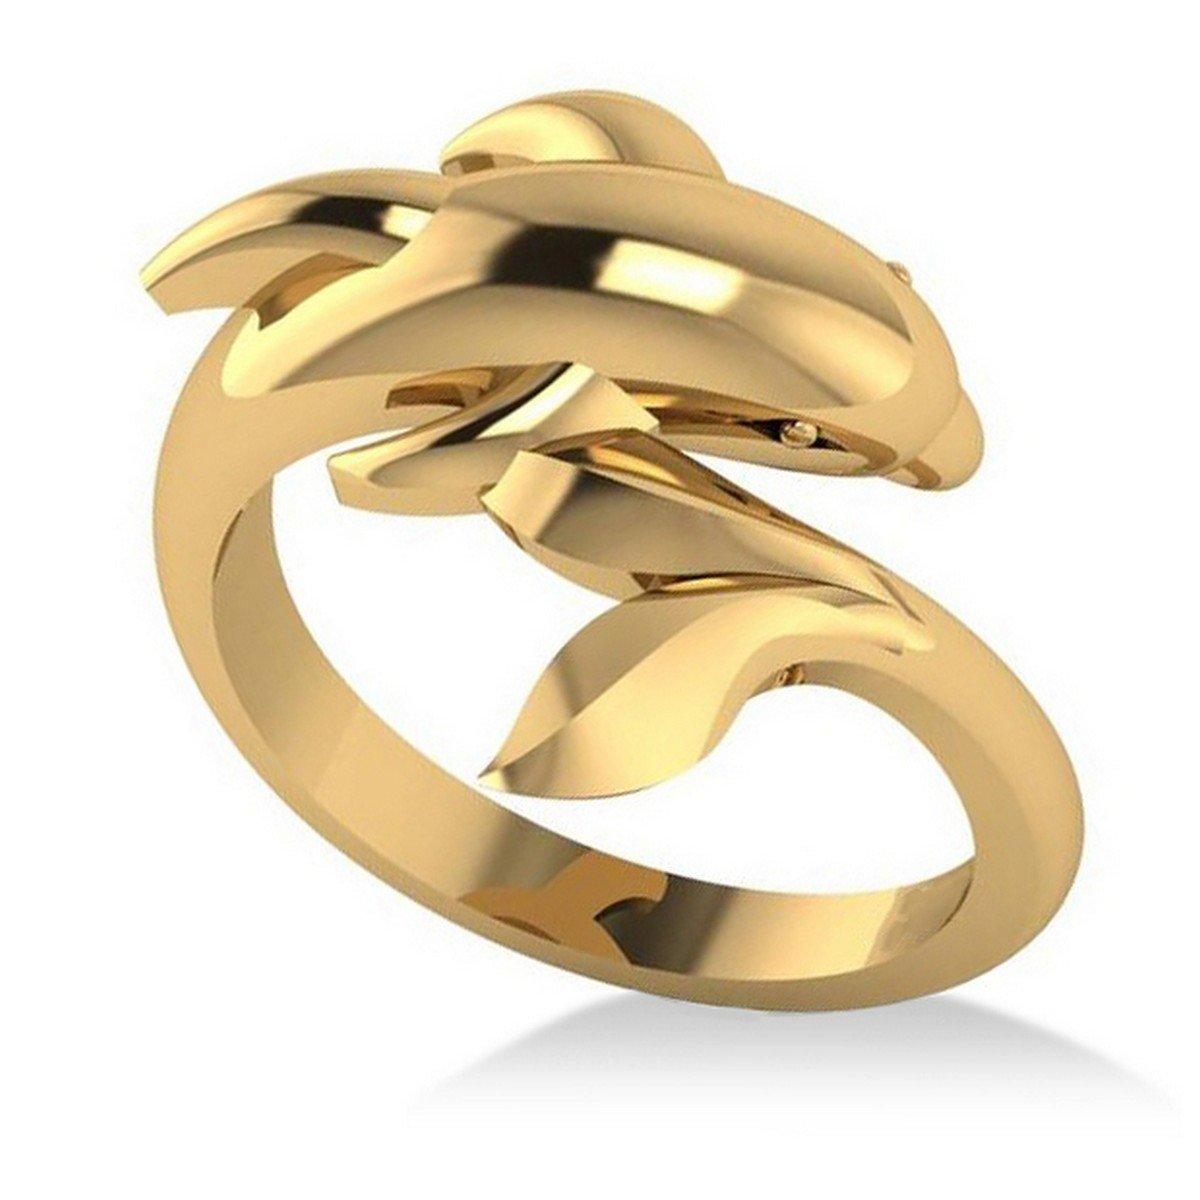 Allurez Summertime Dolphin Fashion Ring 14k Yellow Gold